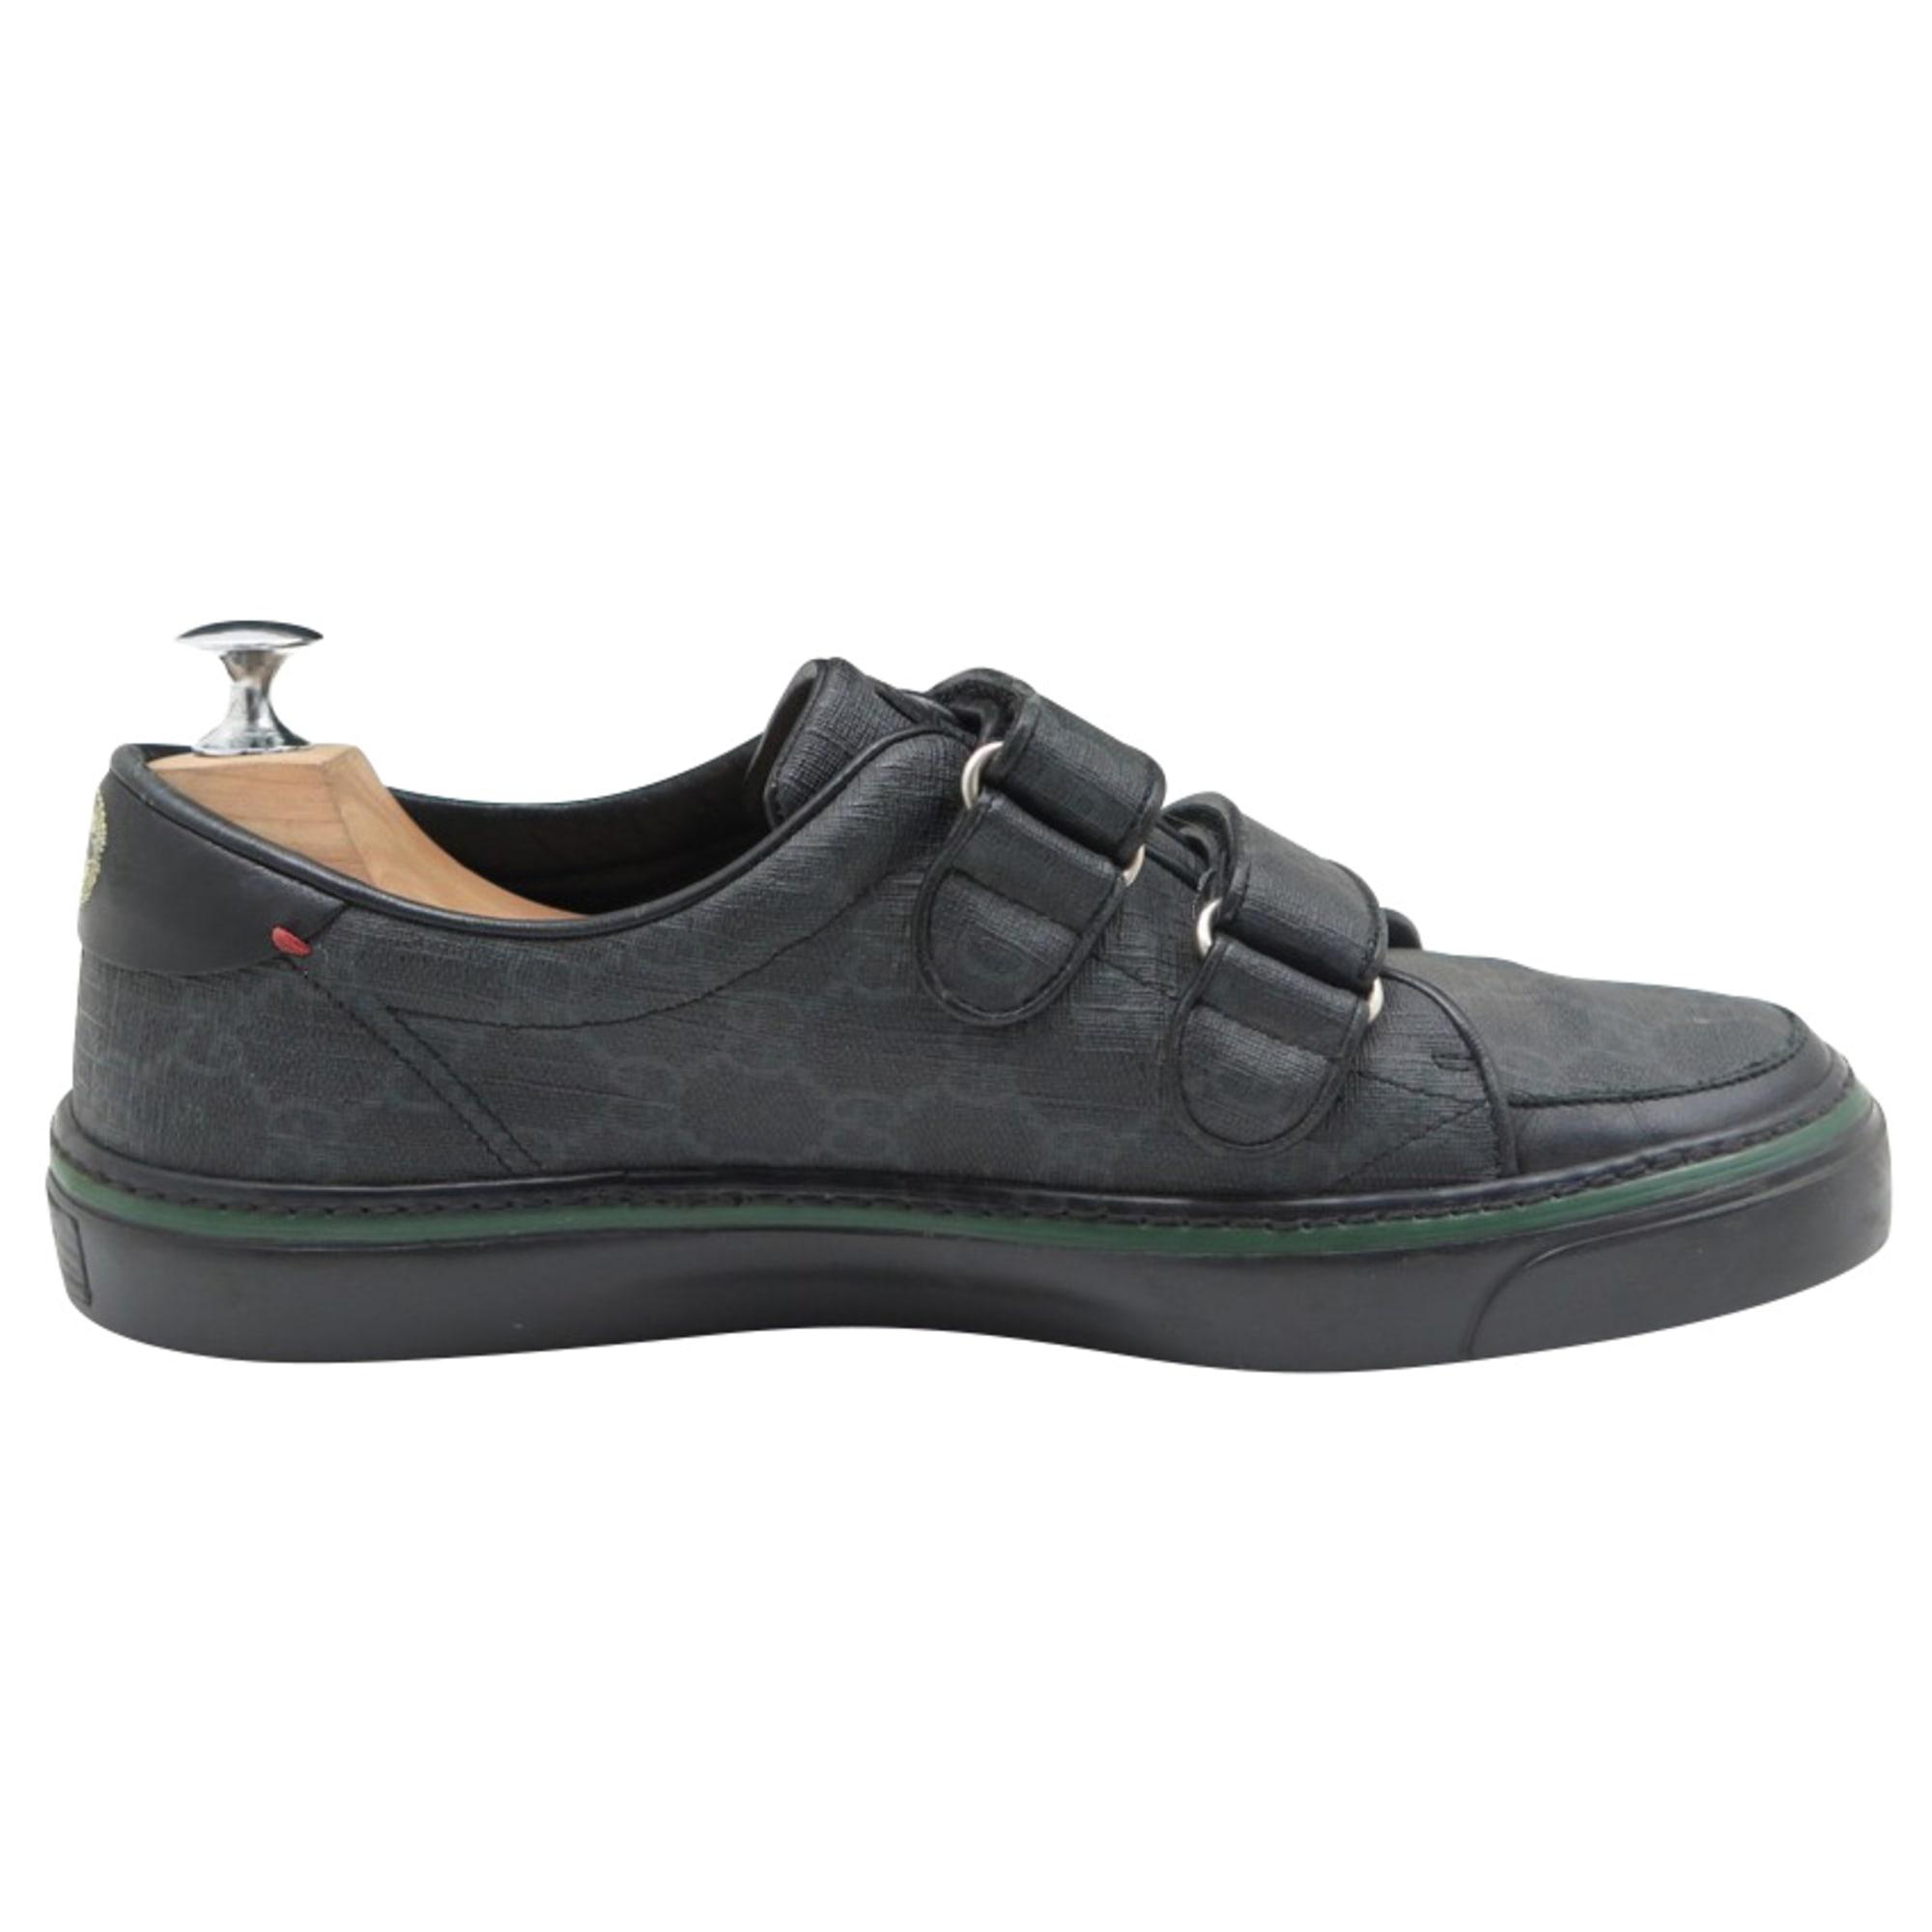 Sneakers GUCCI Grau, anthrazit